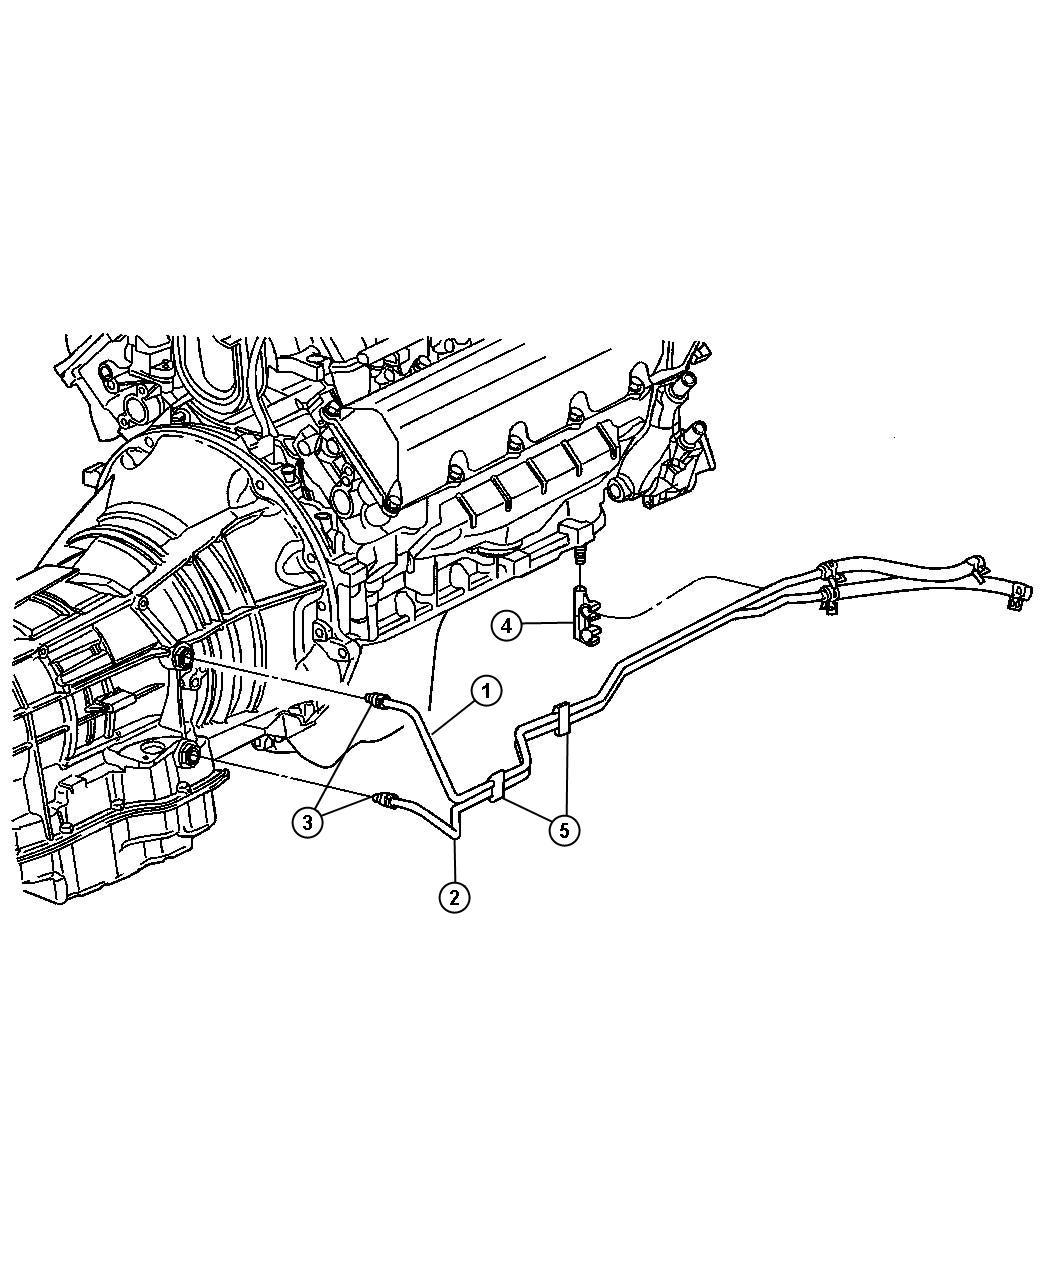 Dodge Dakota Used For Tube And Hose Oil Cooler